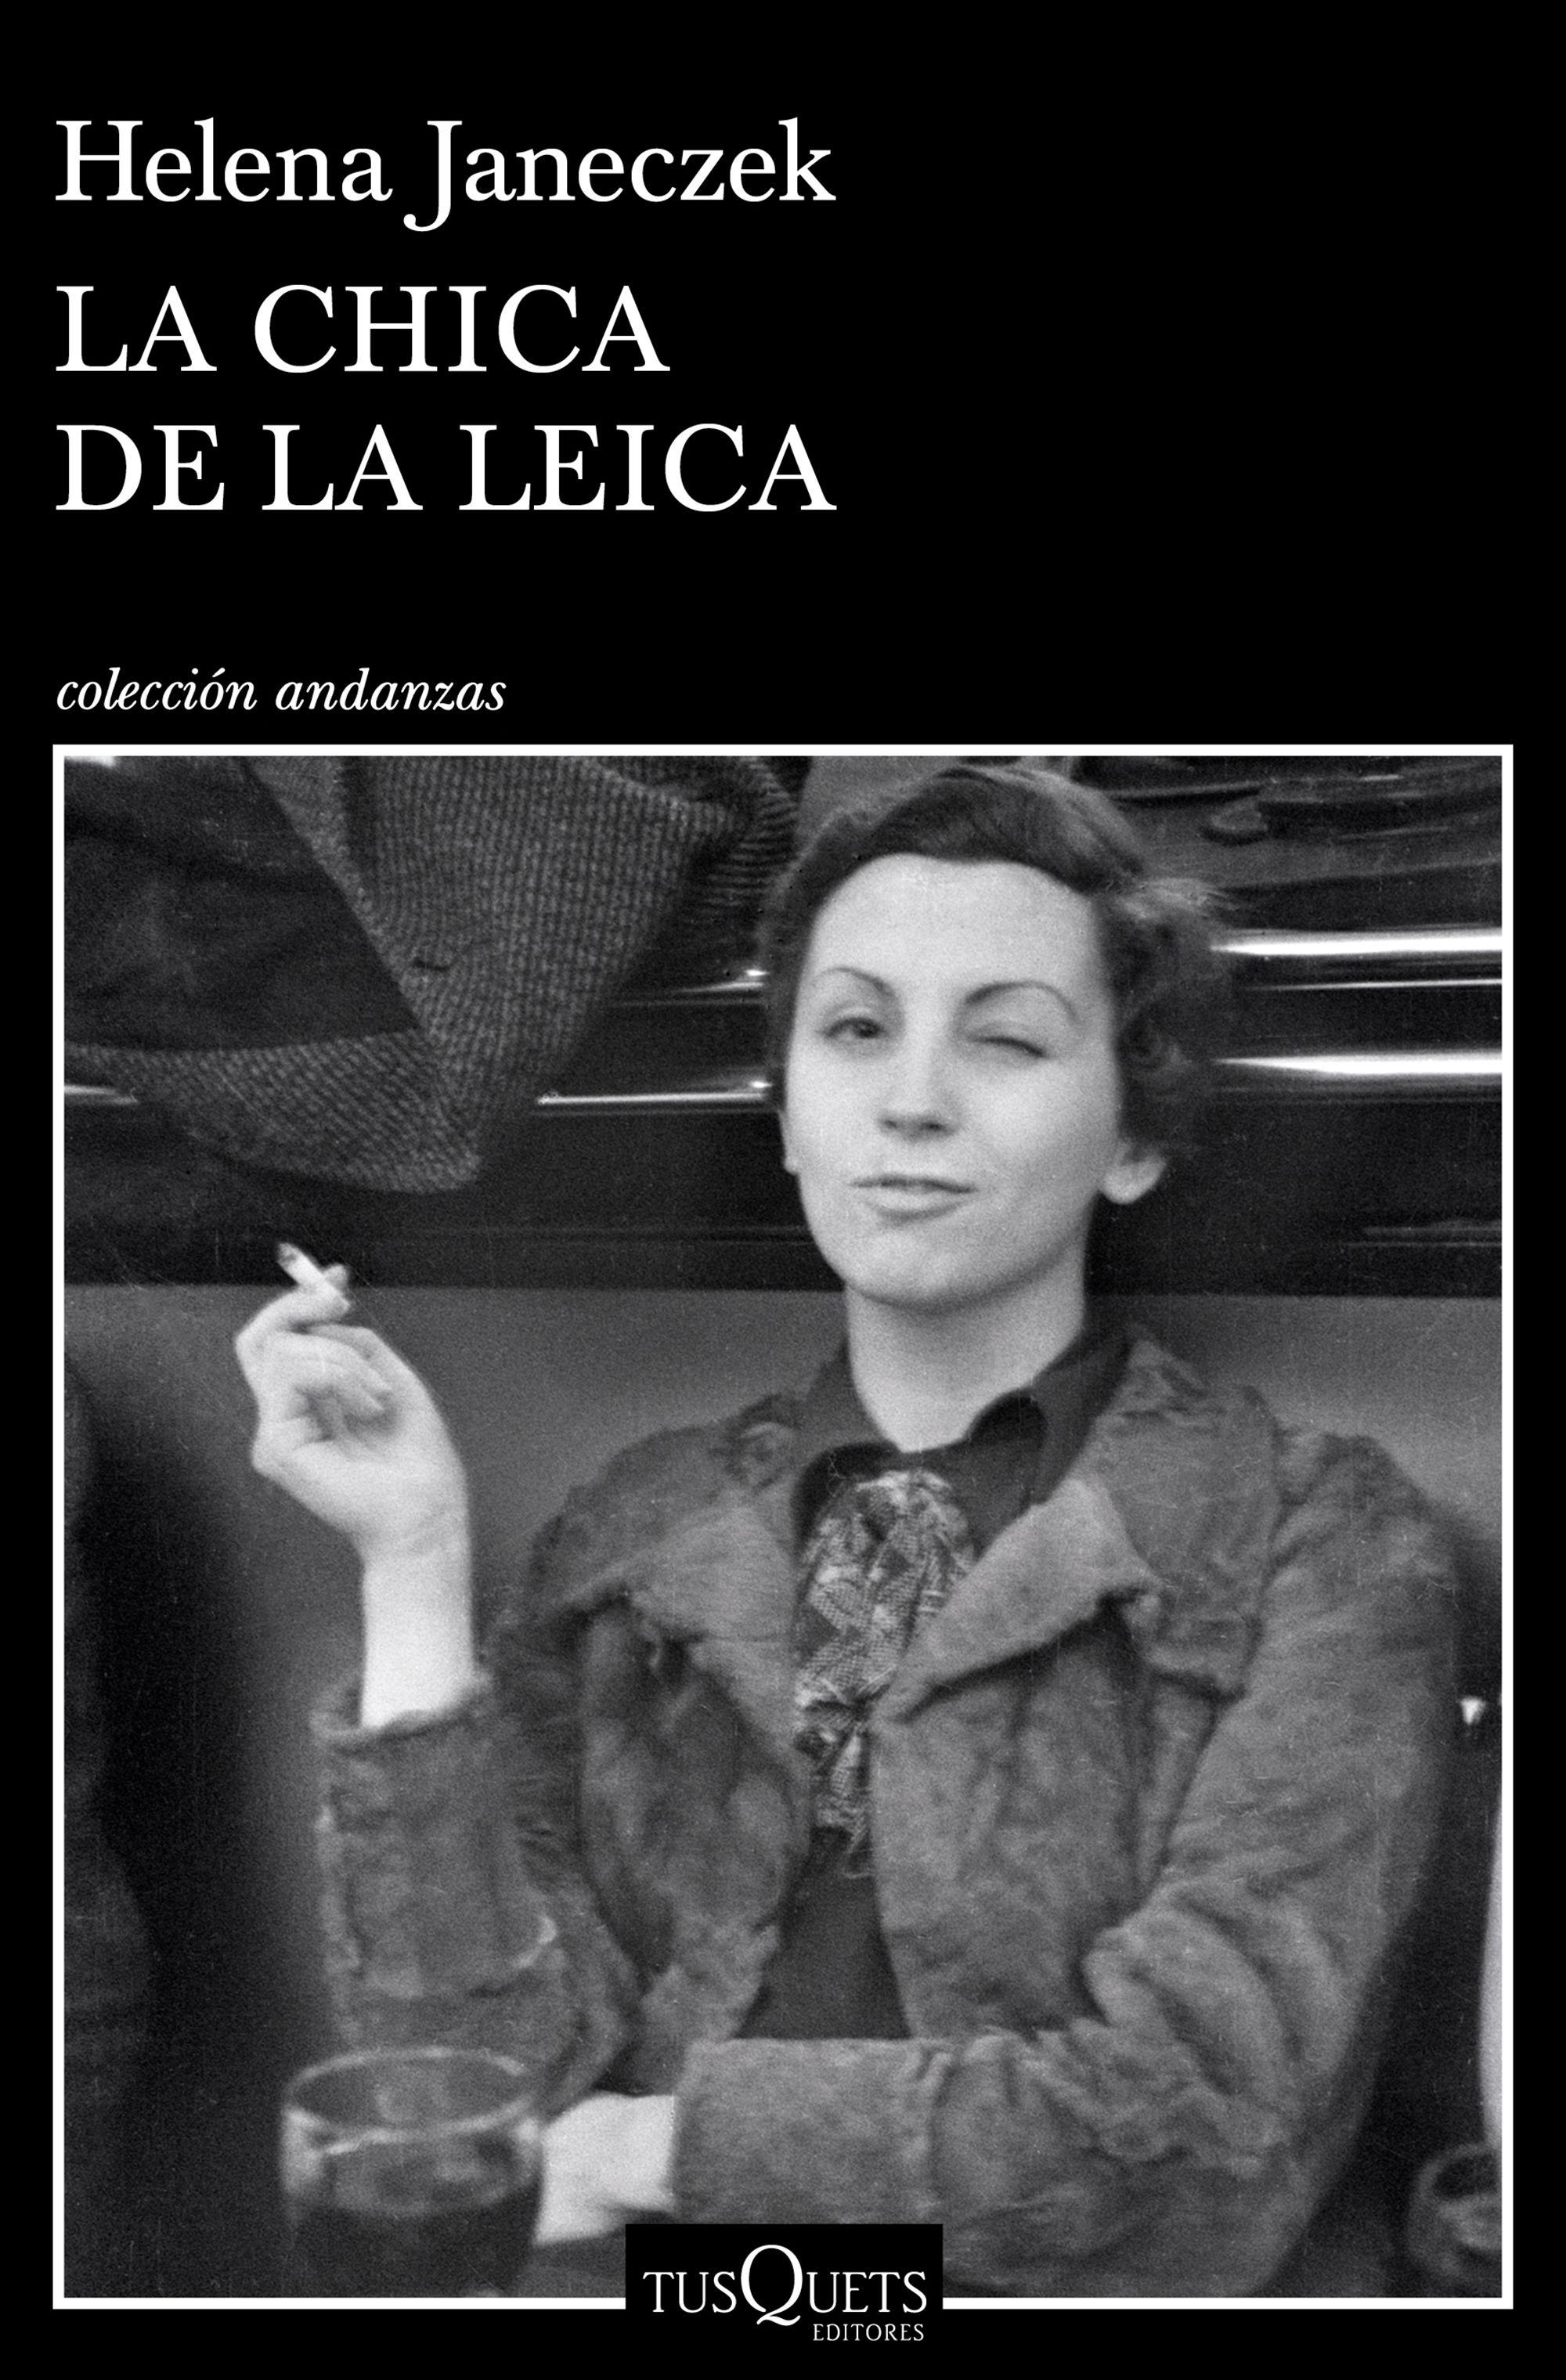 La chica de la Leica, de Helena Janeczek